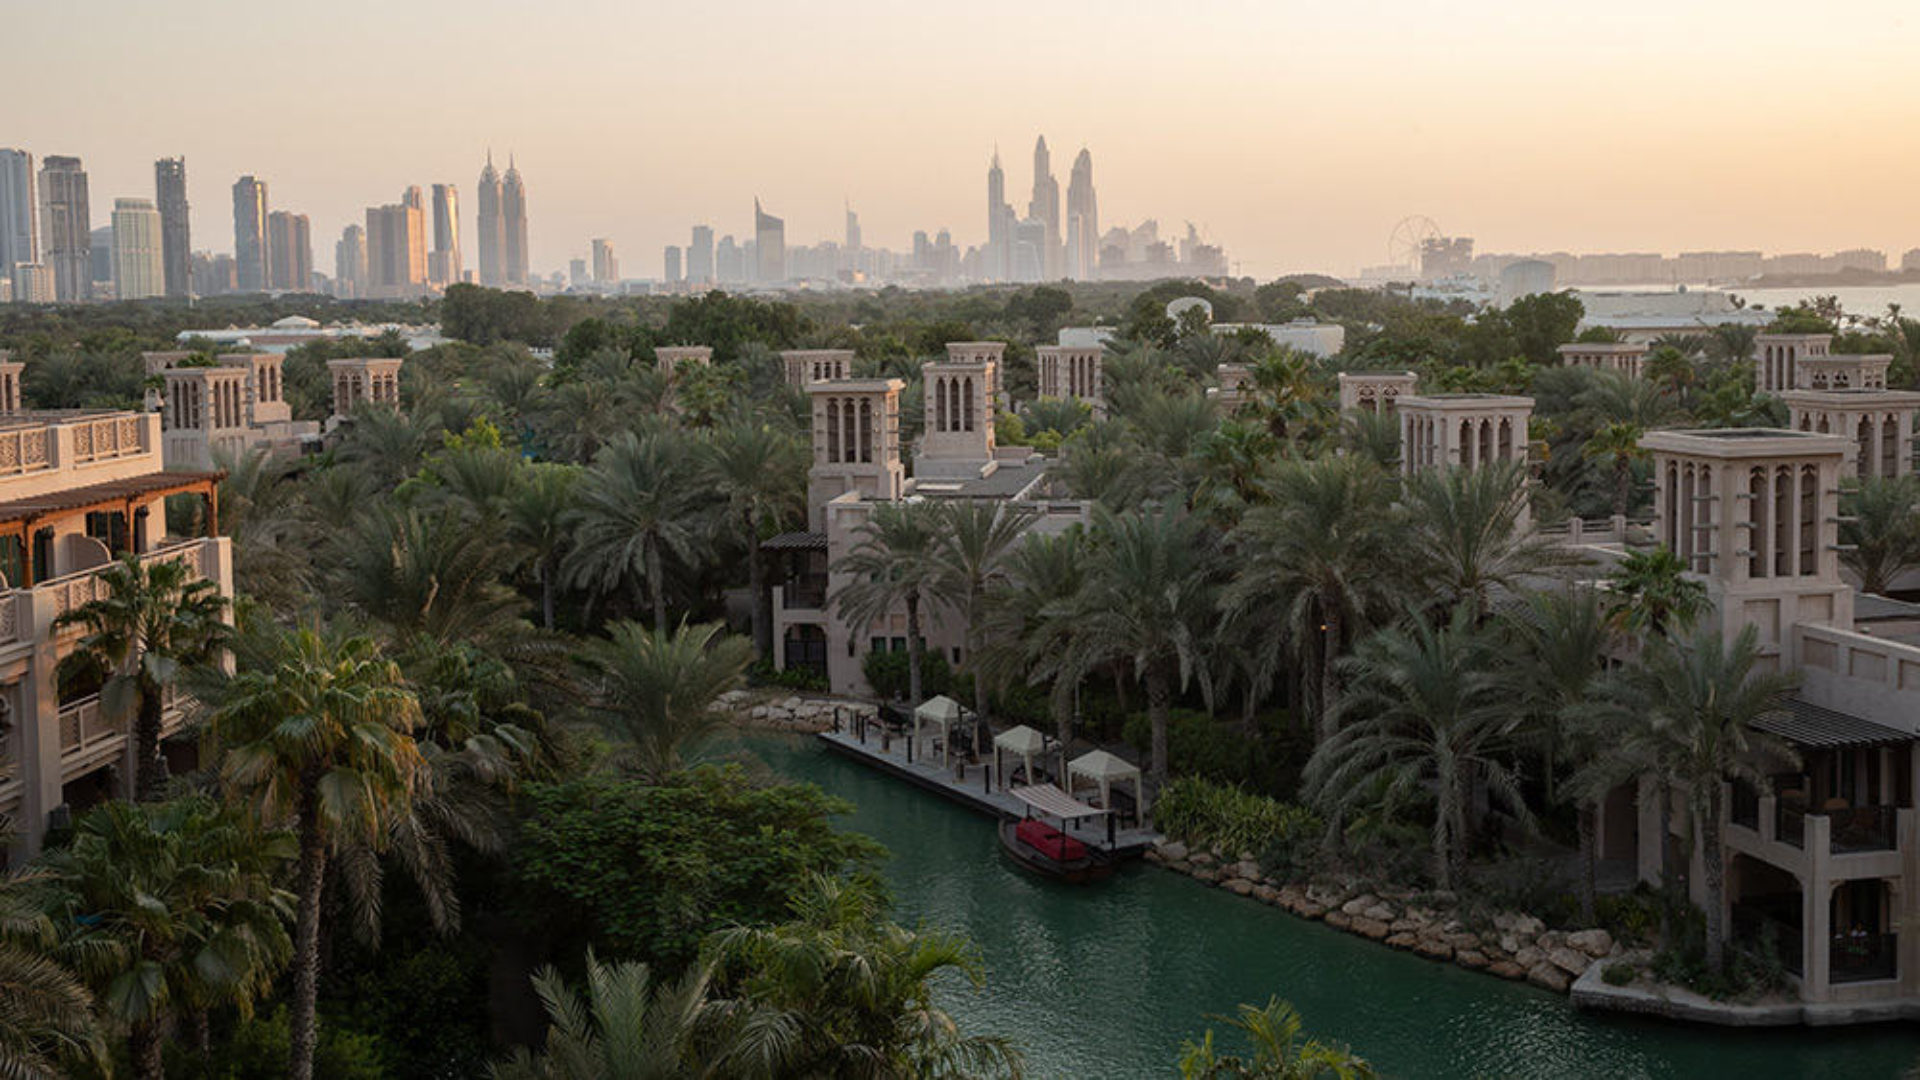 View of Dubai skyline at sunset from Jumeirah Dar Al Masyaf